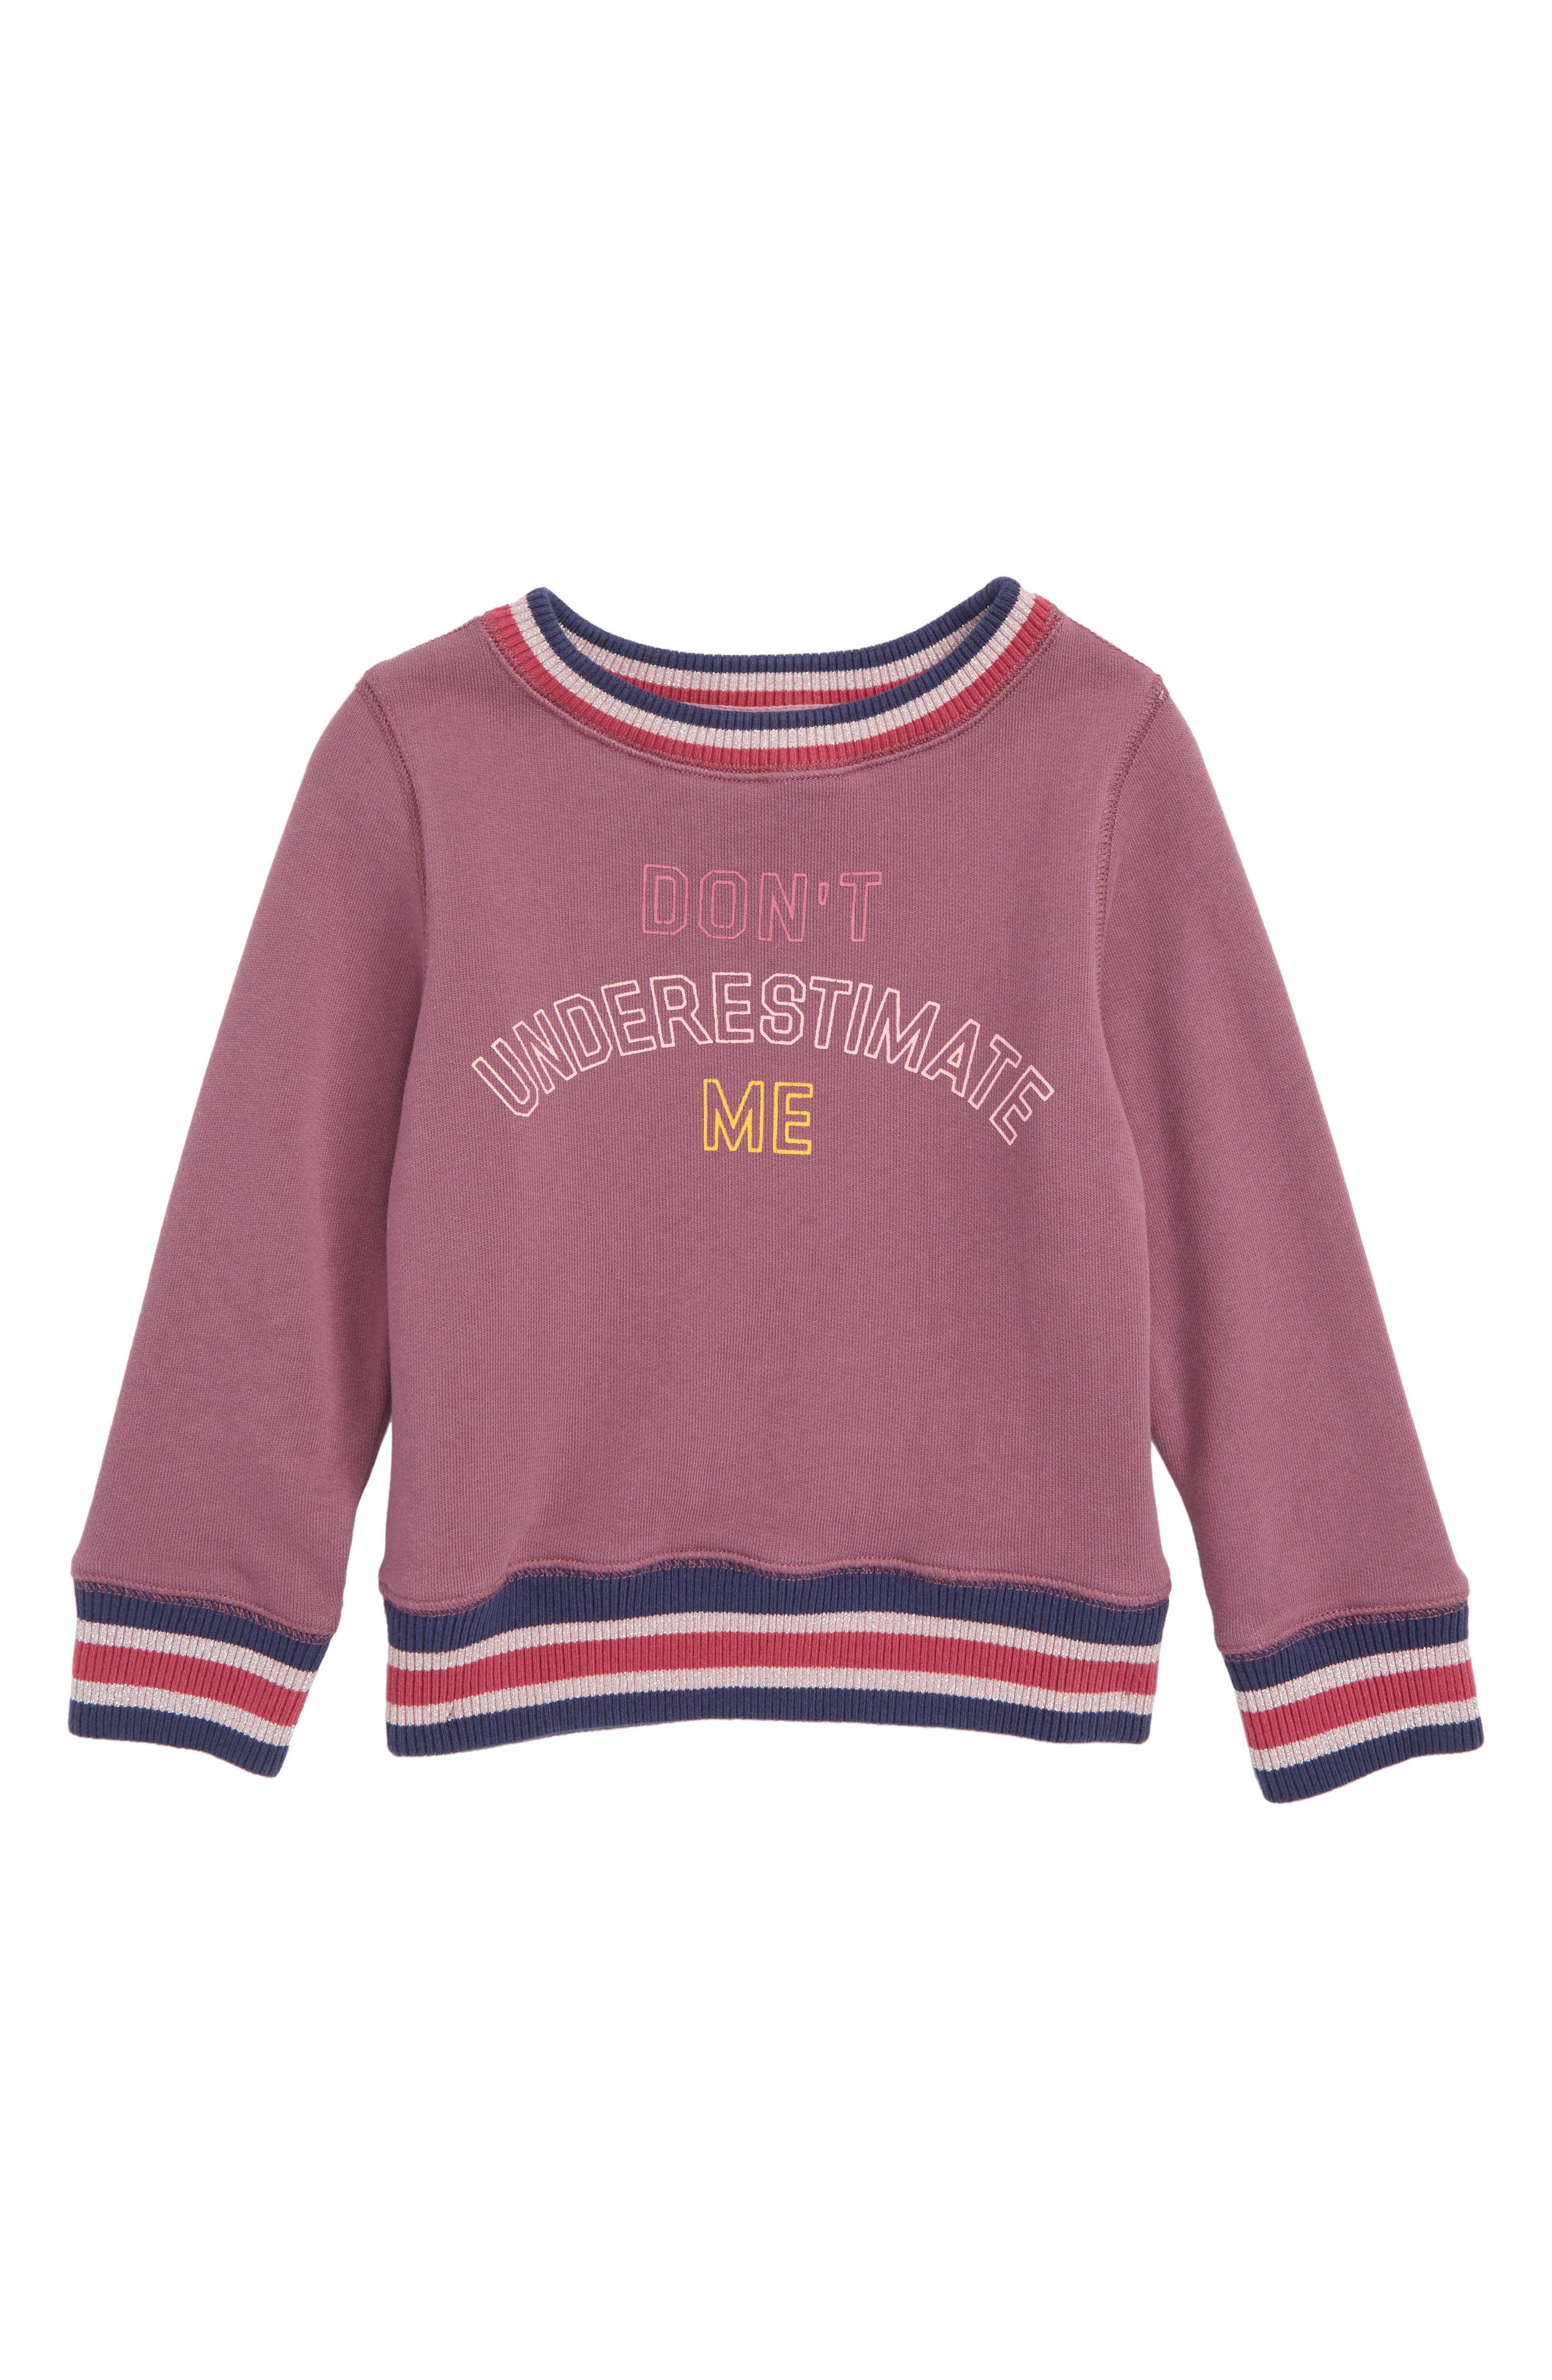 Don't Underestimate Me Sweatshirt,                         Main,                         color, 500